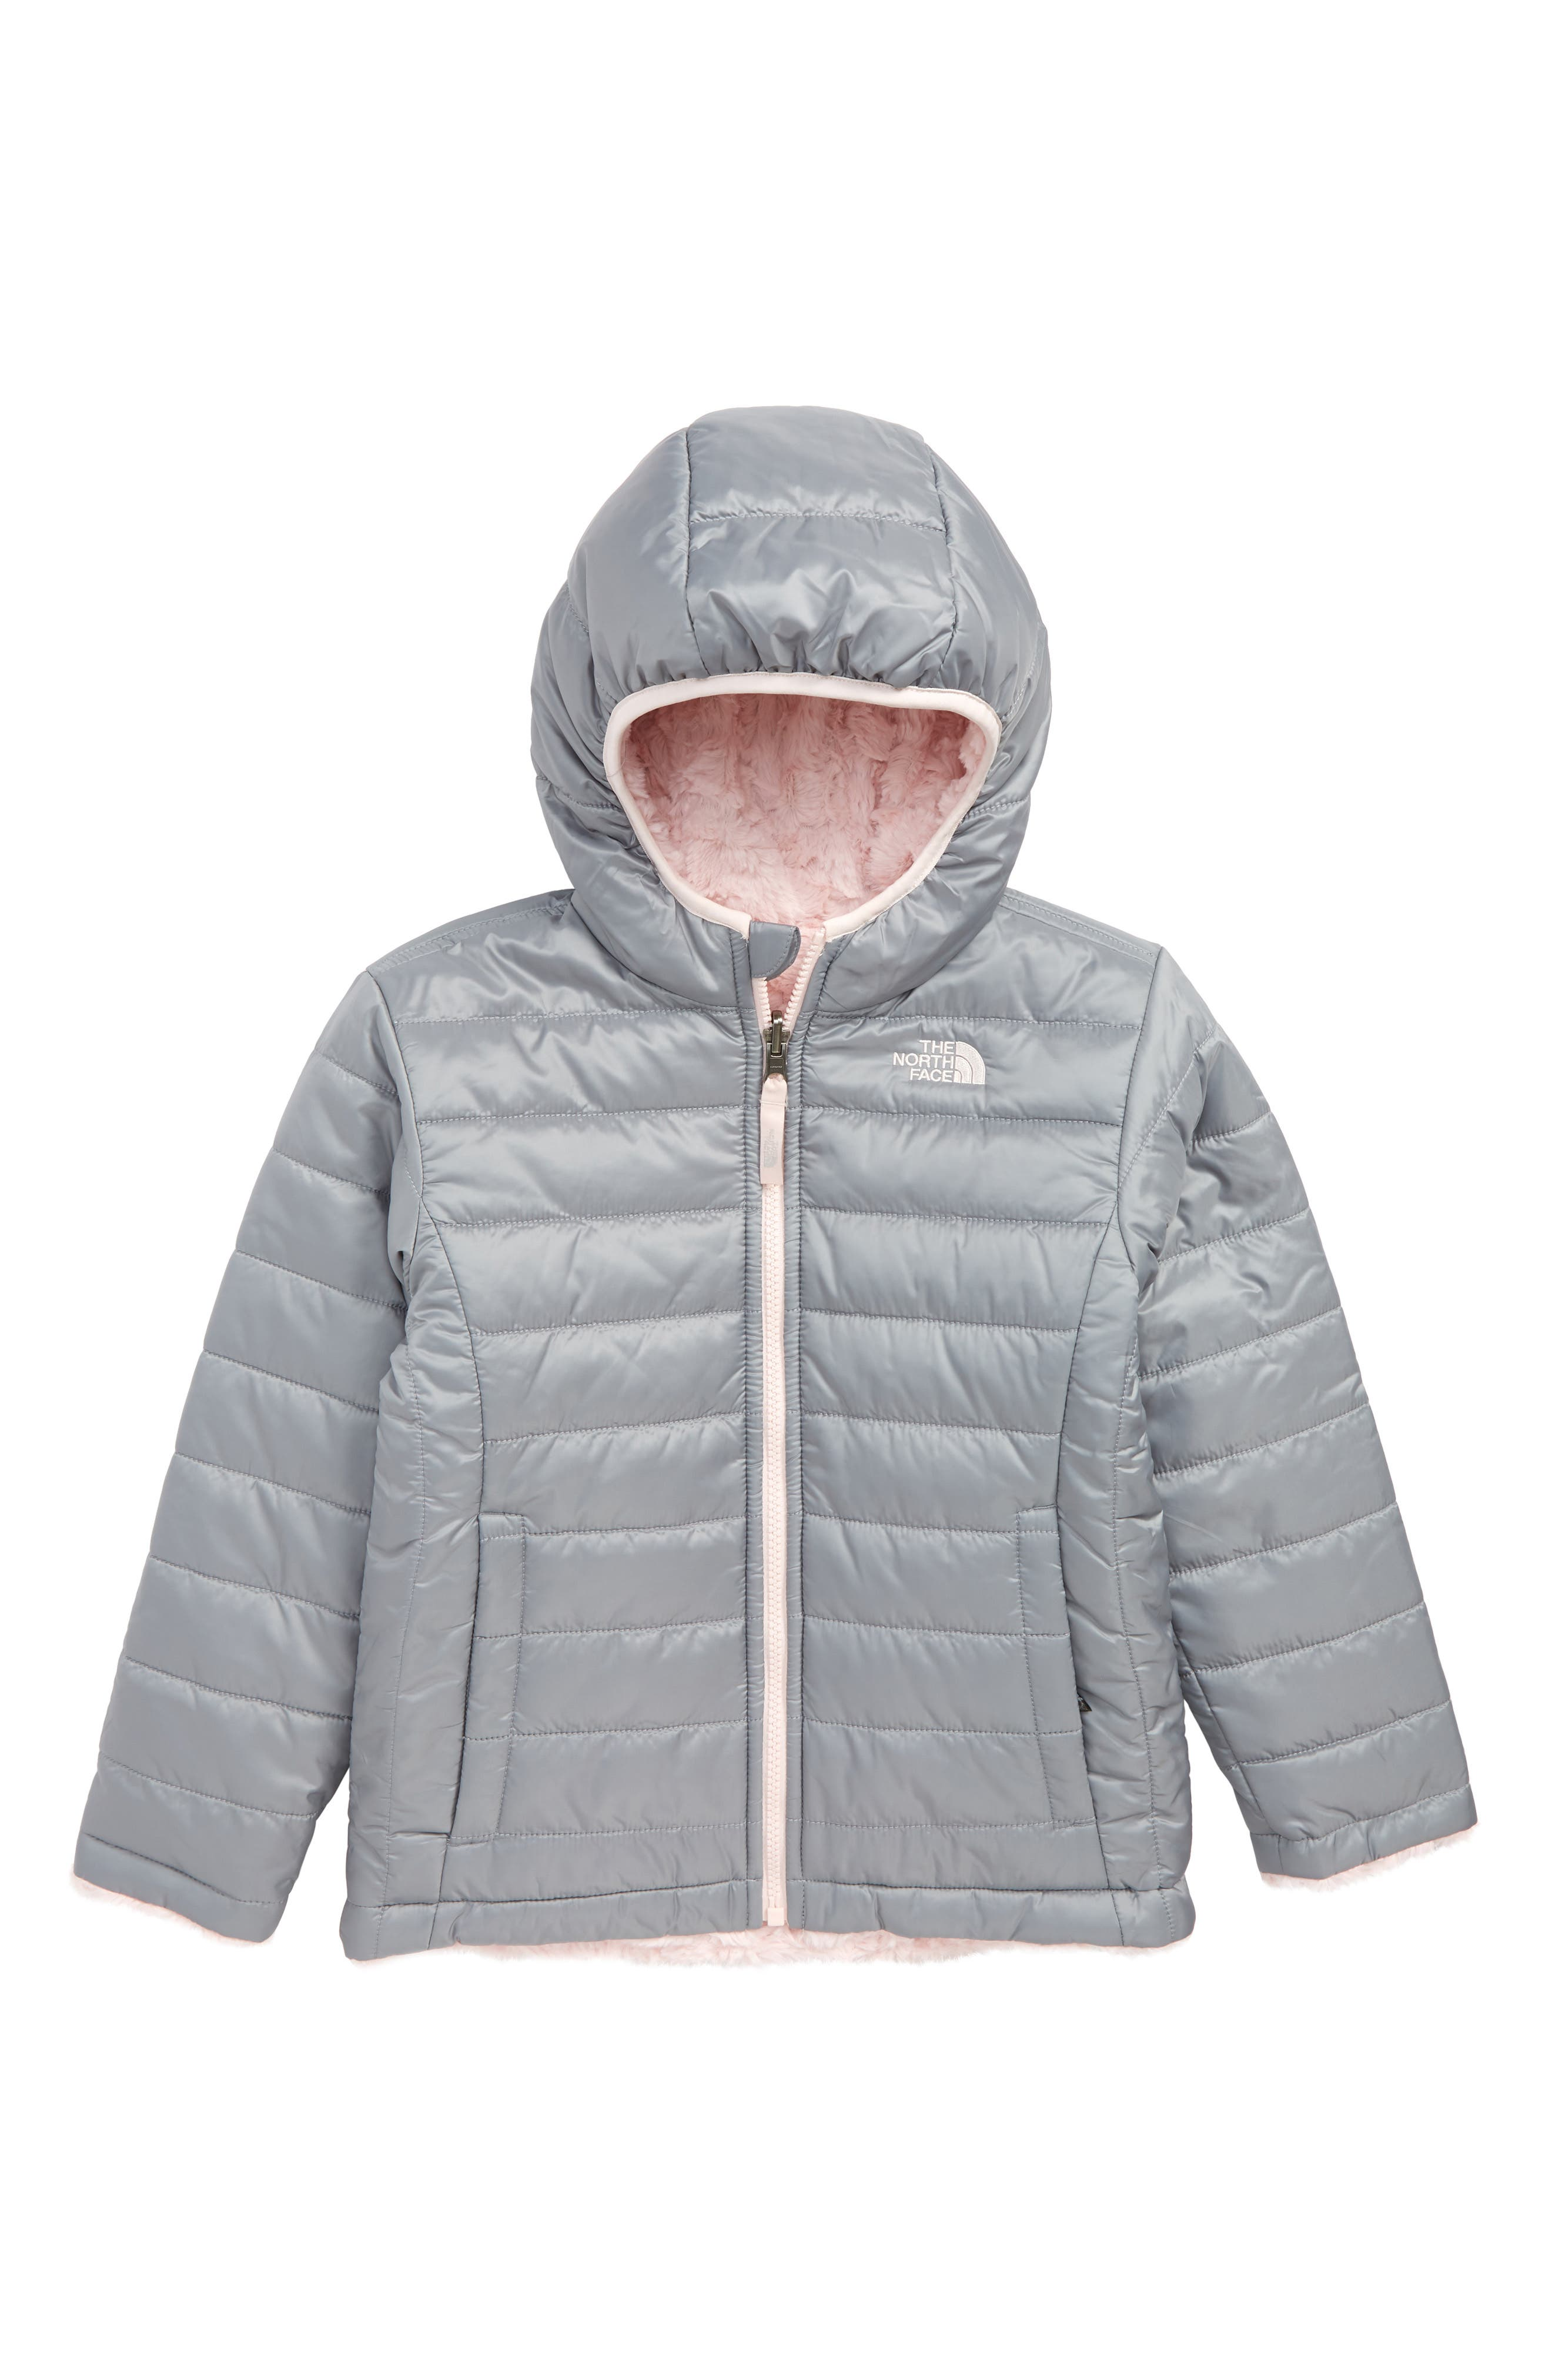 Mossbud Reversible Water Repellent Jacket,                         Main,                         color, MID GREY